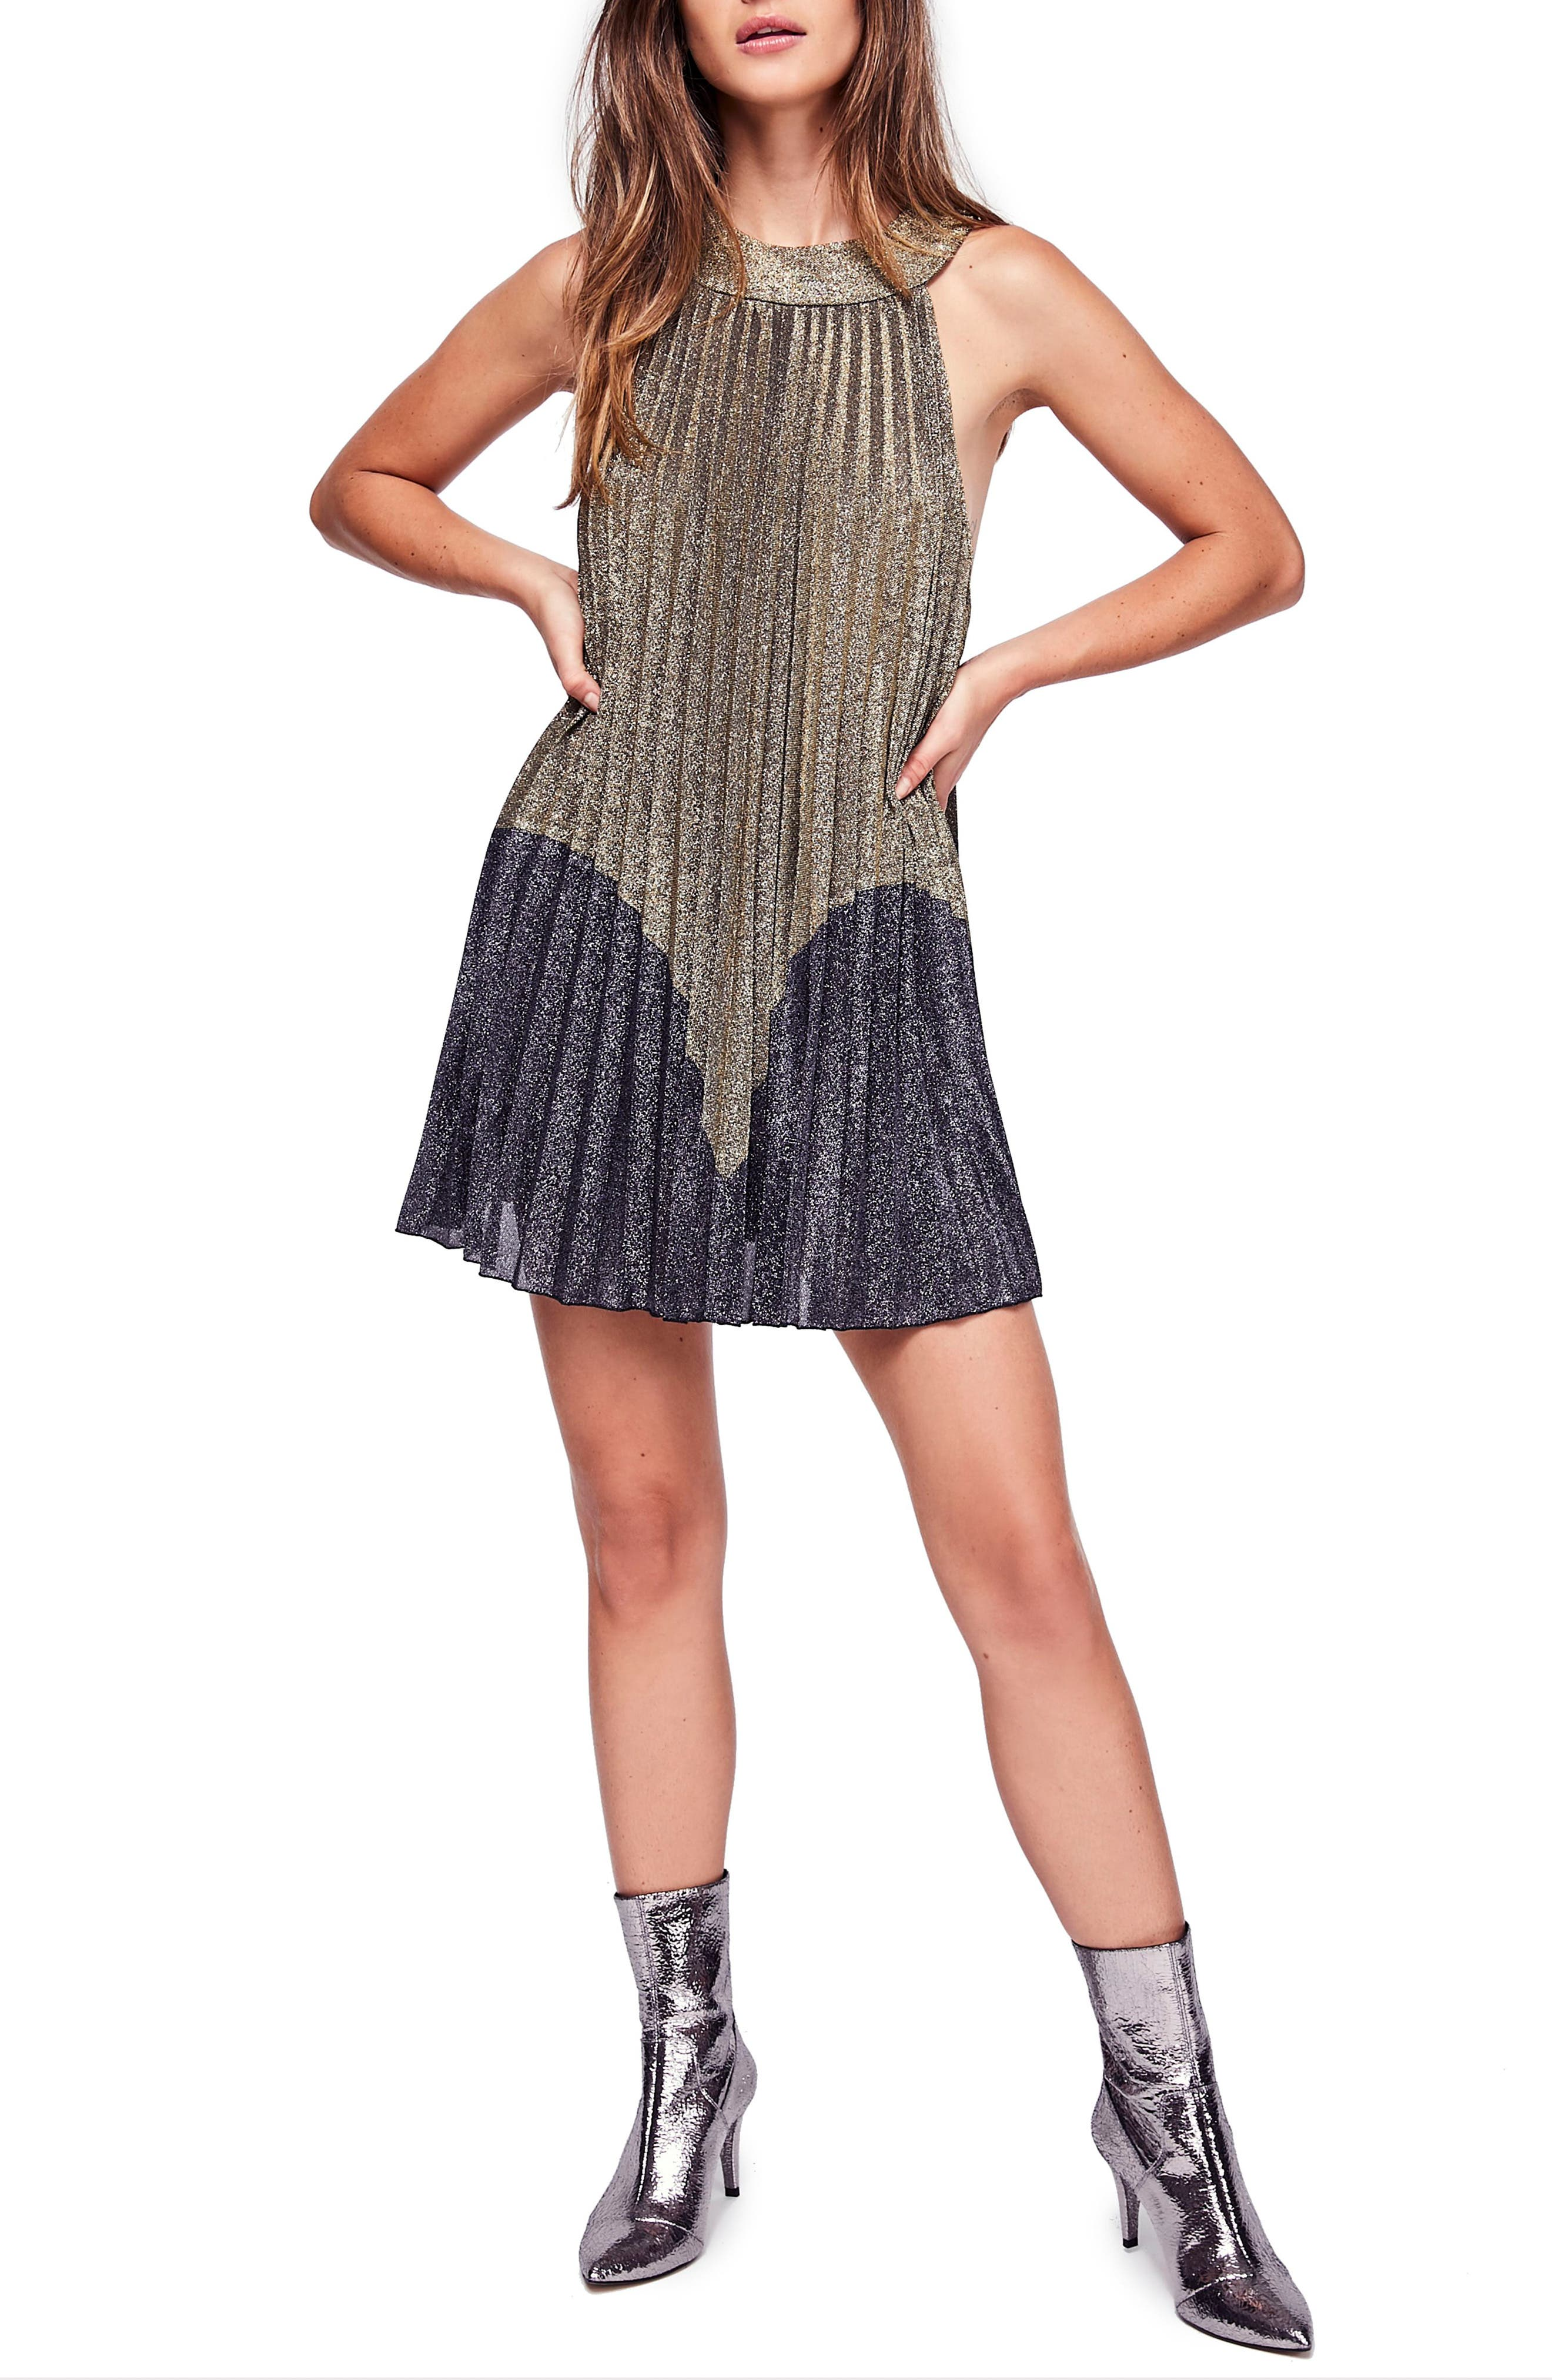 Vintage Evening Dresses Womens Free People Pleated Love Minidress Size X-Large - Metallic $98.00 AT vintagedancer.com